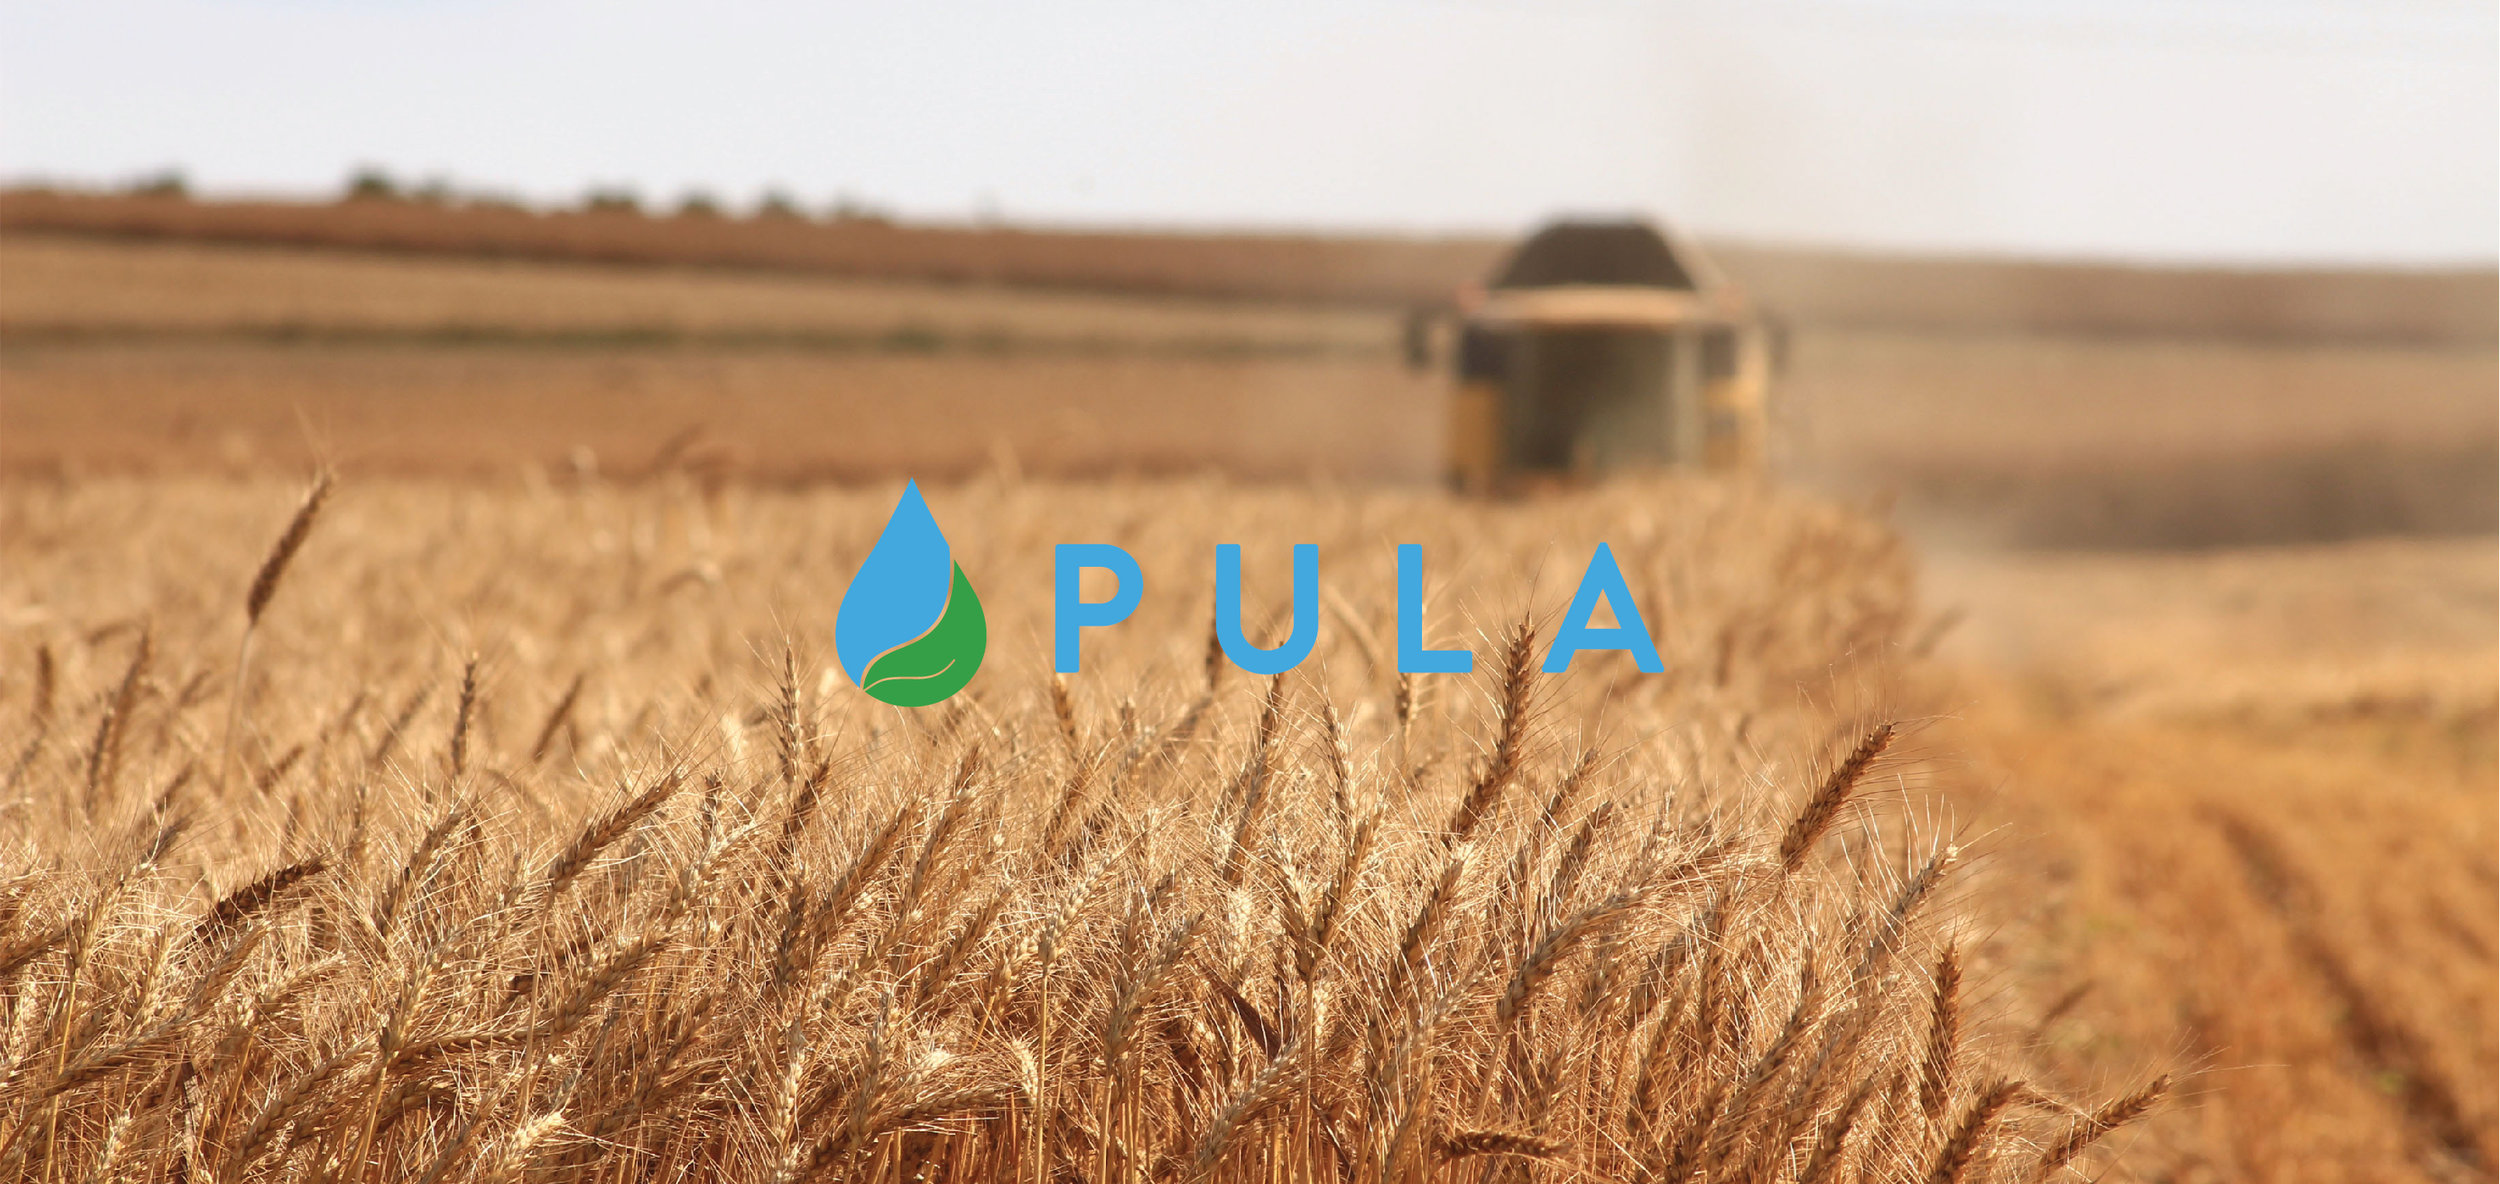 PULA-01.jpg